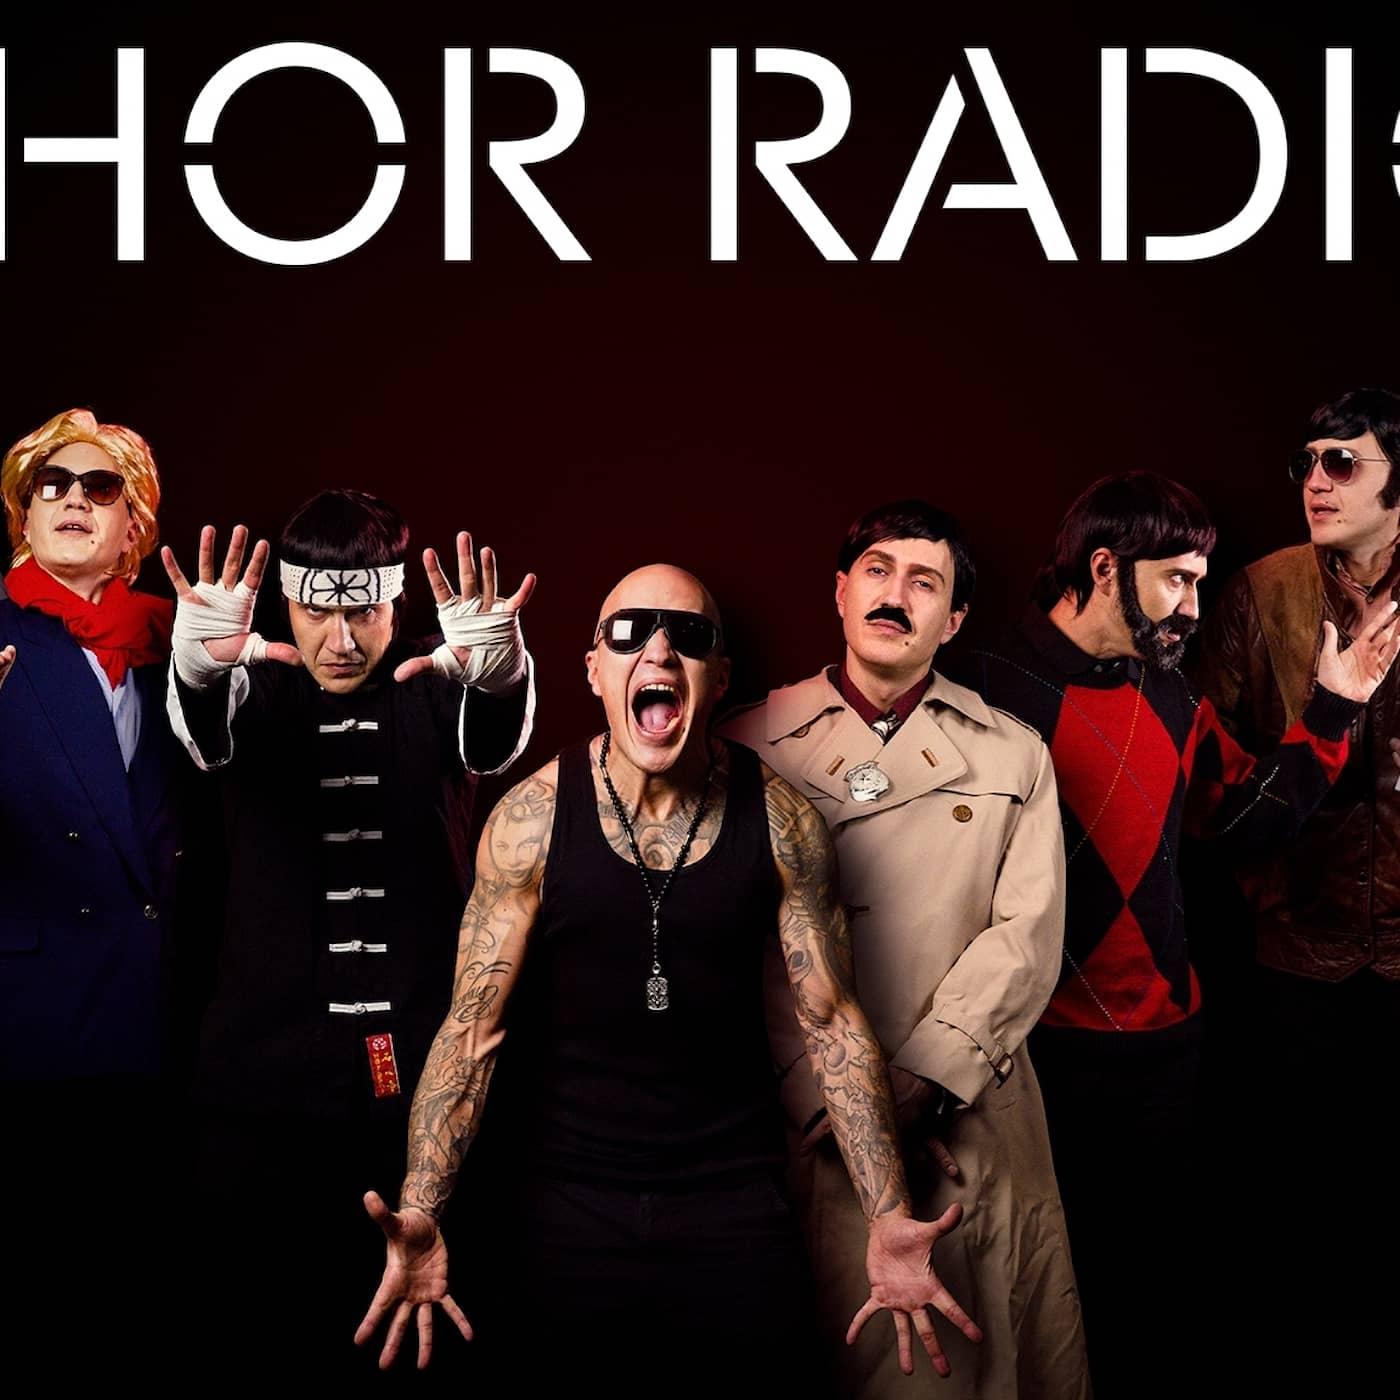 THOR Radio 2018 Avsnitt 1 - Don't call it a comeback!